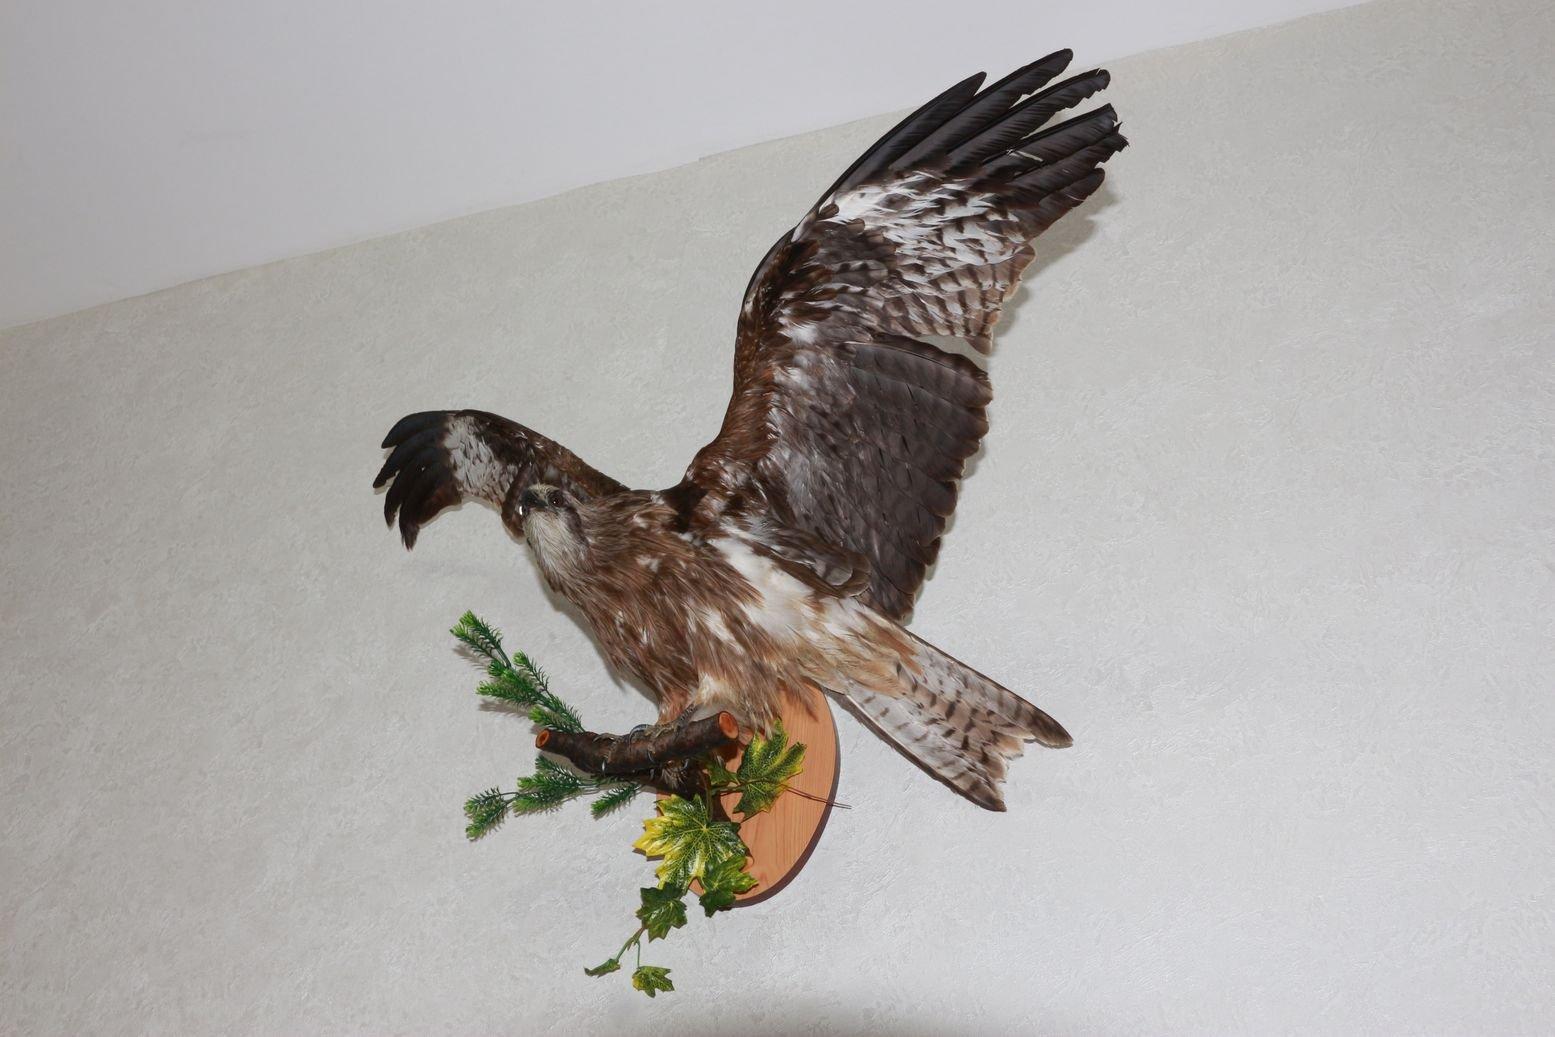 Birds For Sale >> Black Kite Taxidermy Bird Mount Stuffed Bird For Sale Hawk